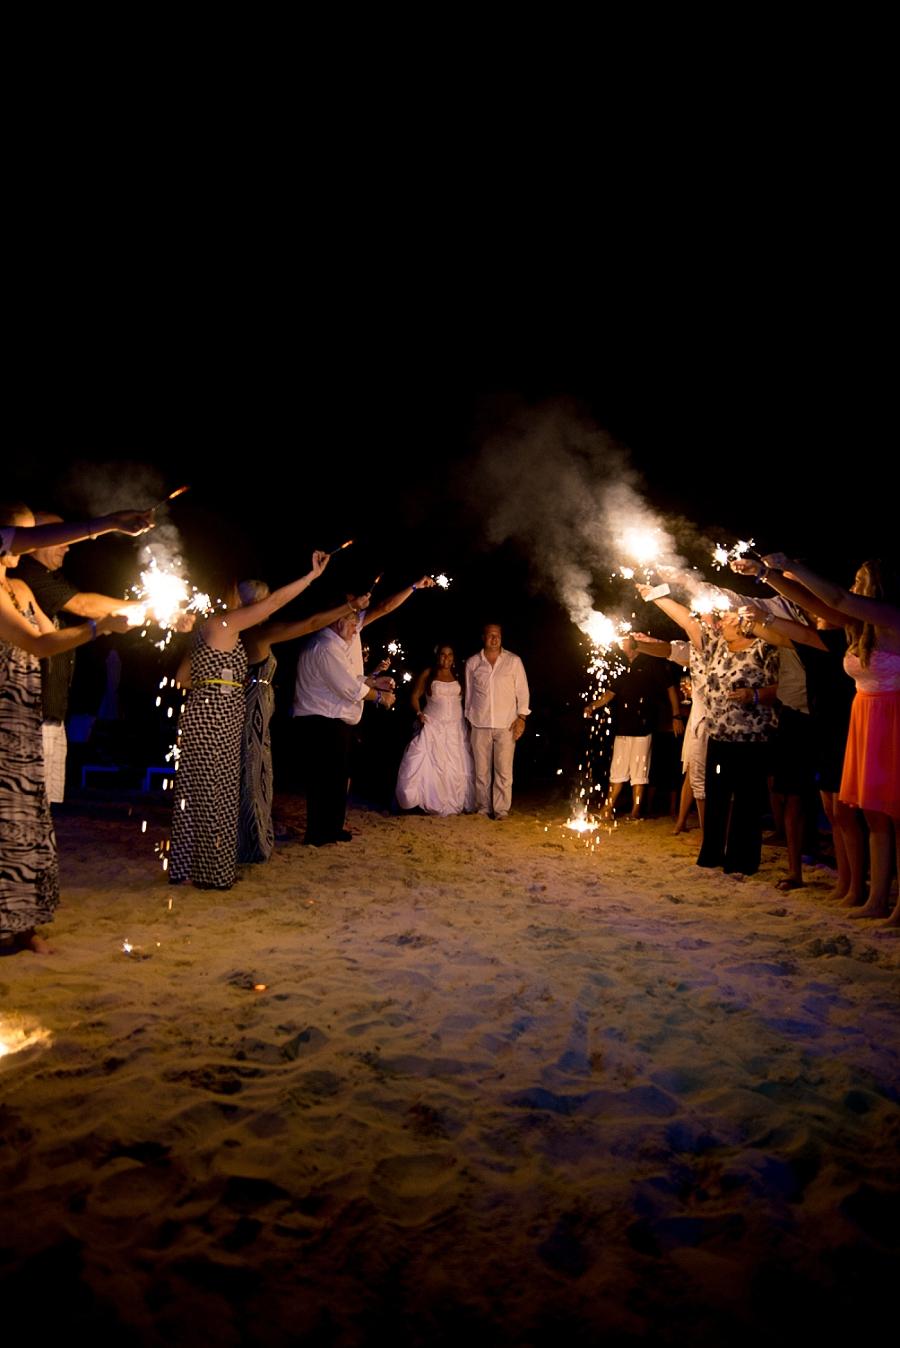 Darren Bester Photography - Cape Town Wedding Photographer - Destination Wedding - Thailand - Stacy and Shaun_0100.jpg